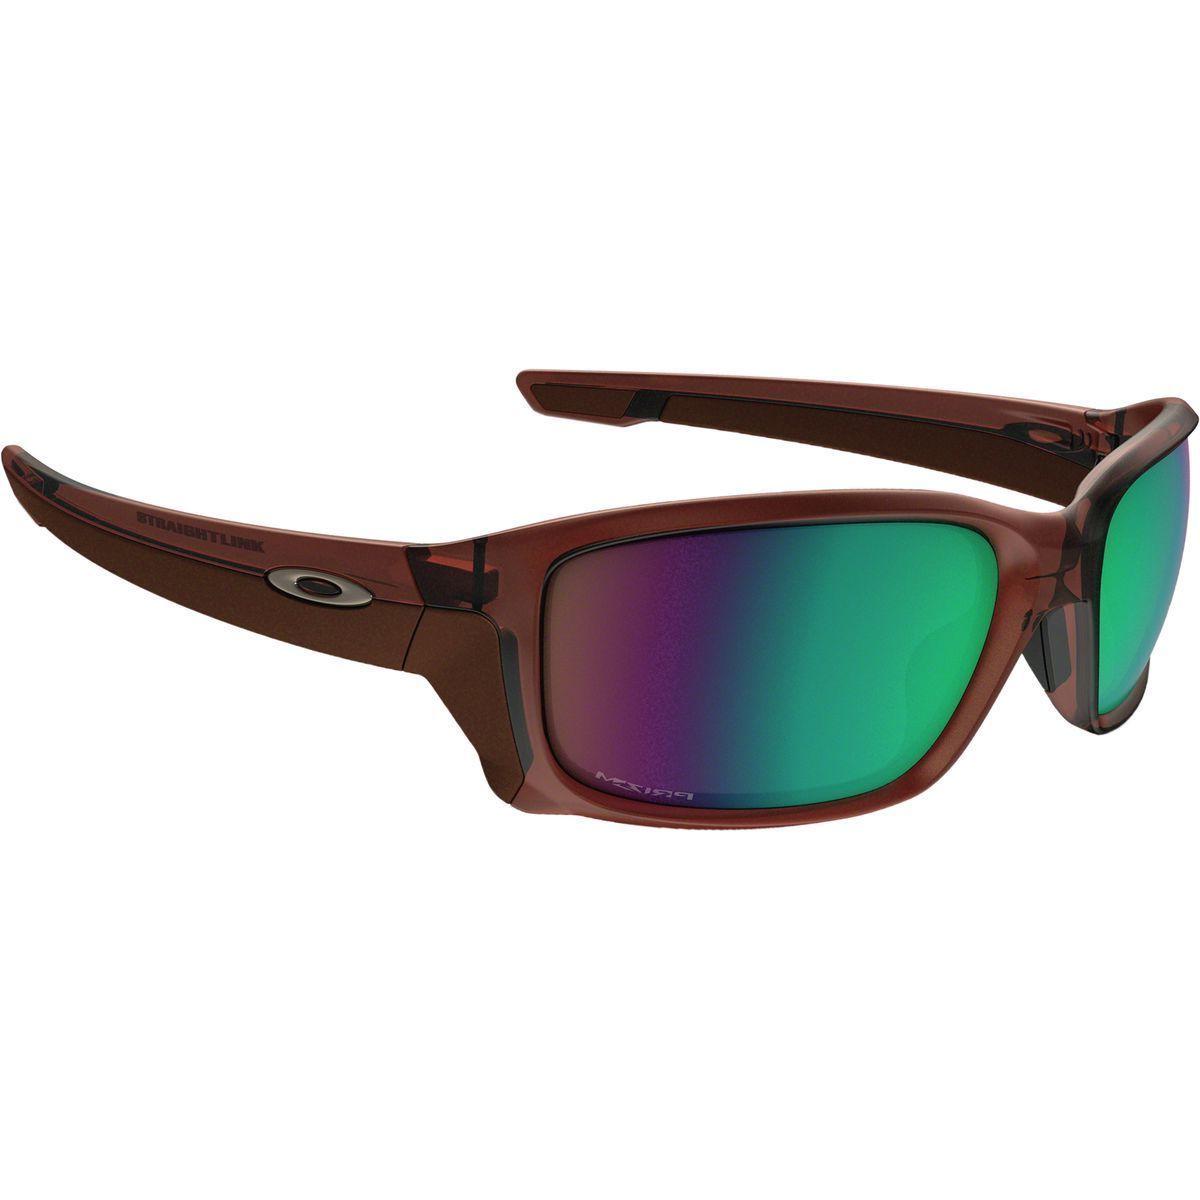 Oakley Straightlink Prizm Polarized Sunglasses - Men's